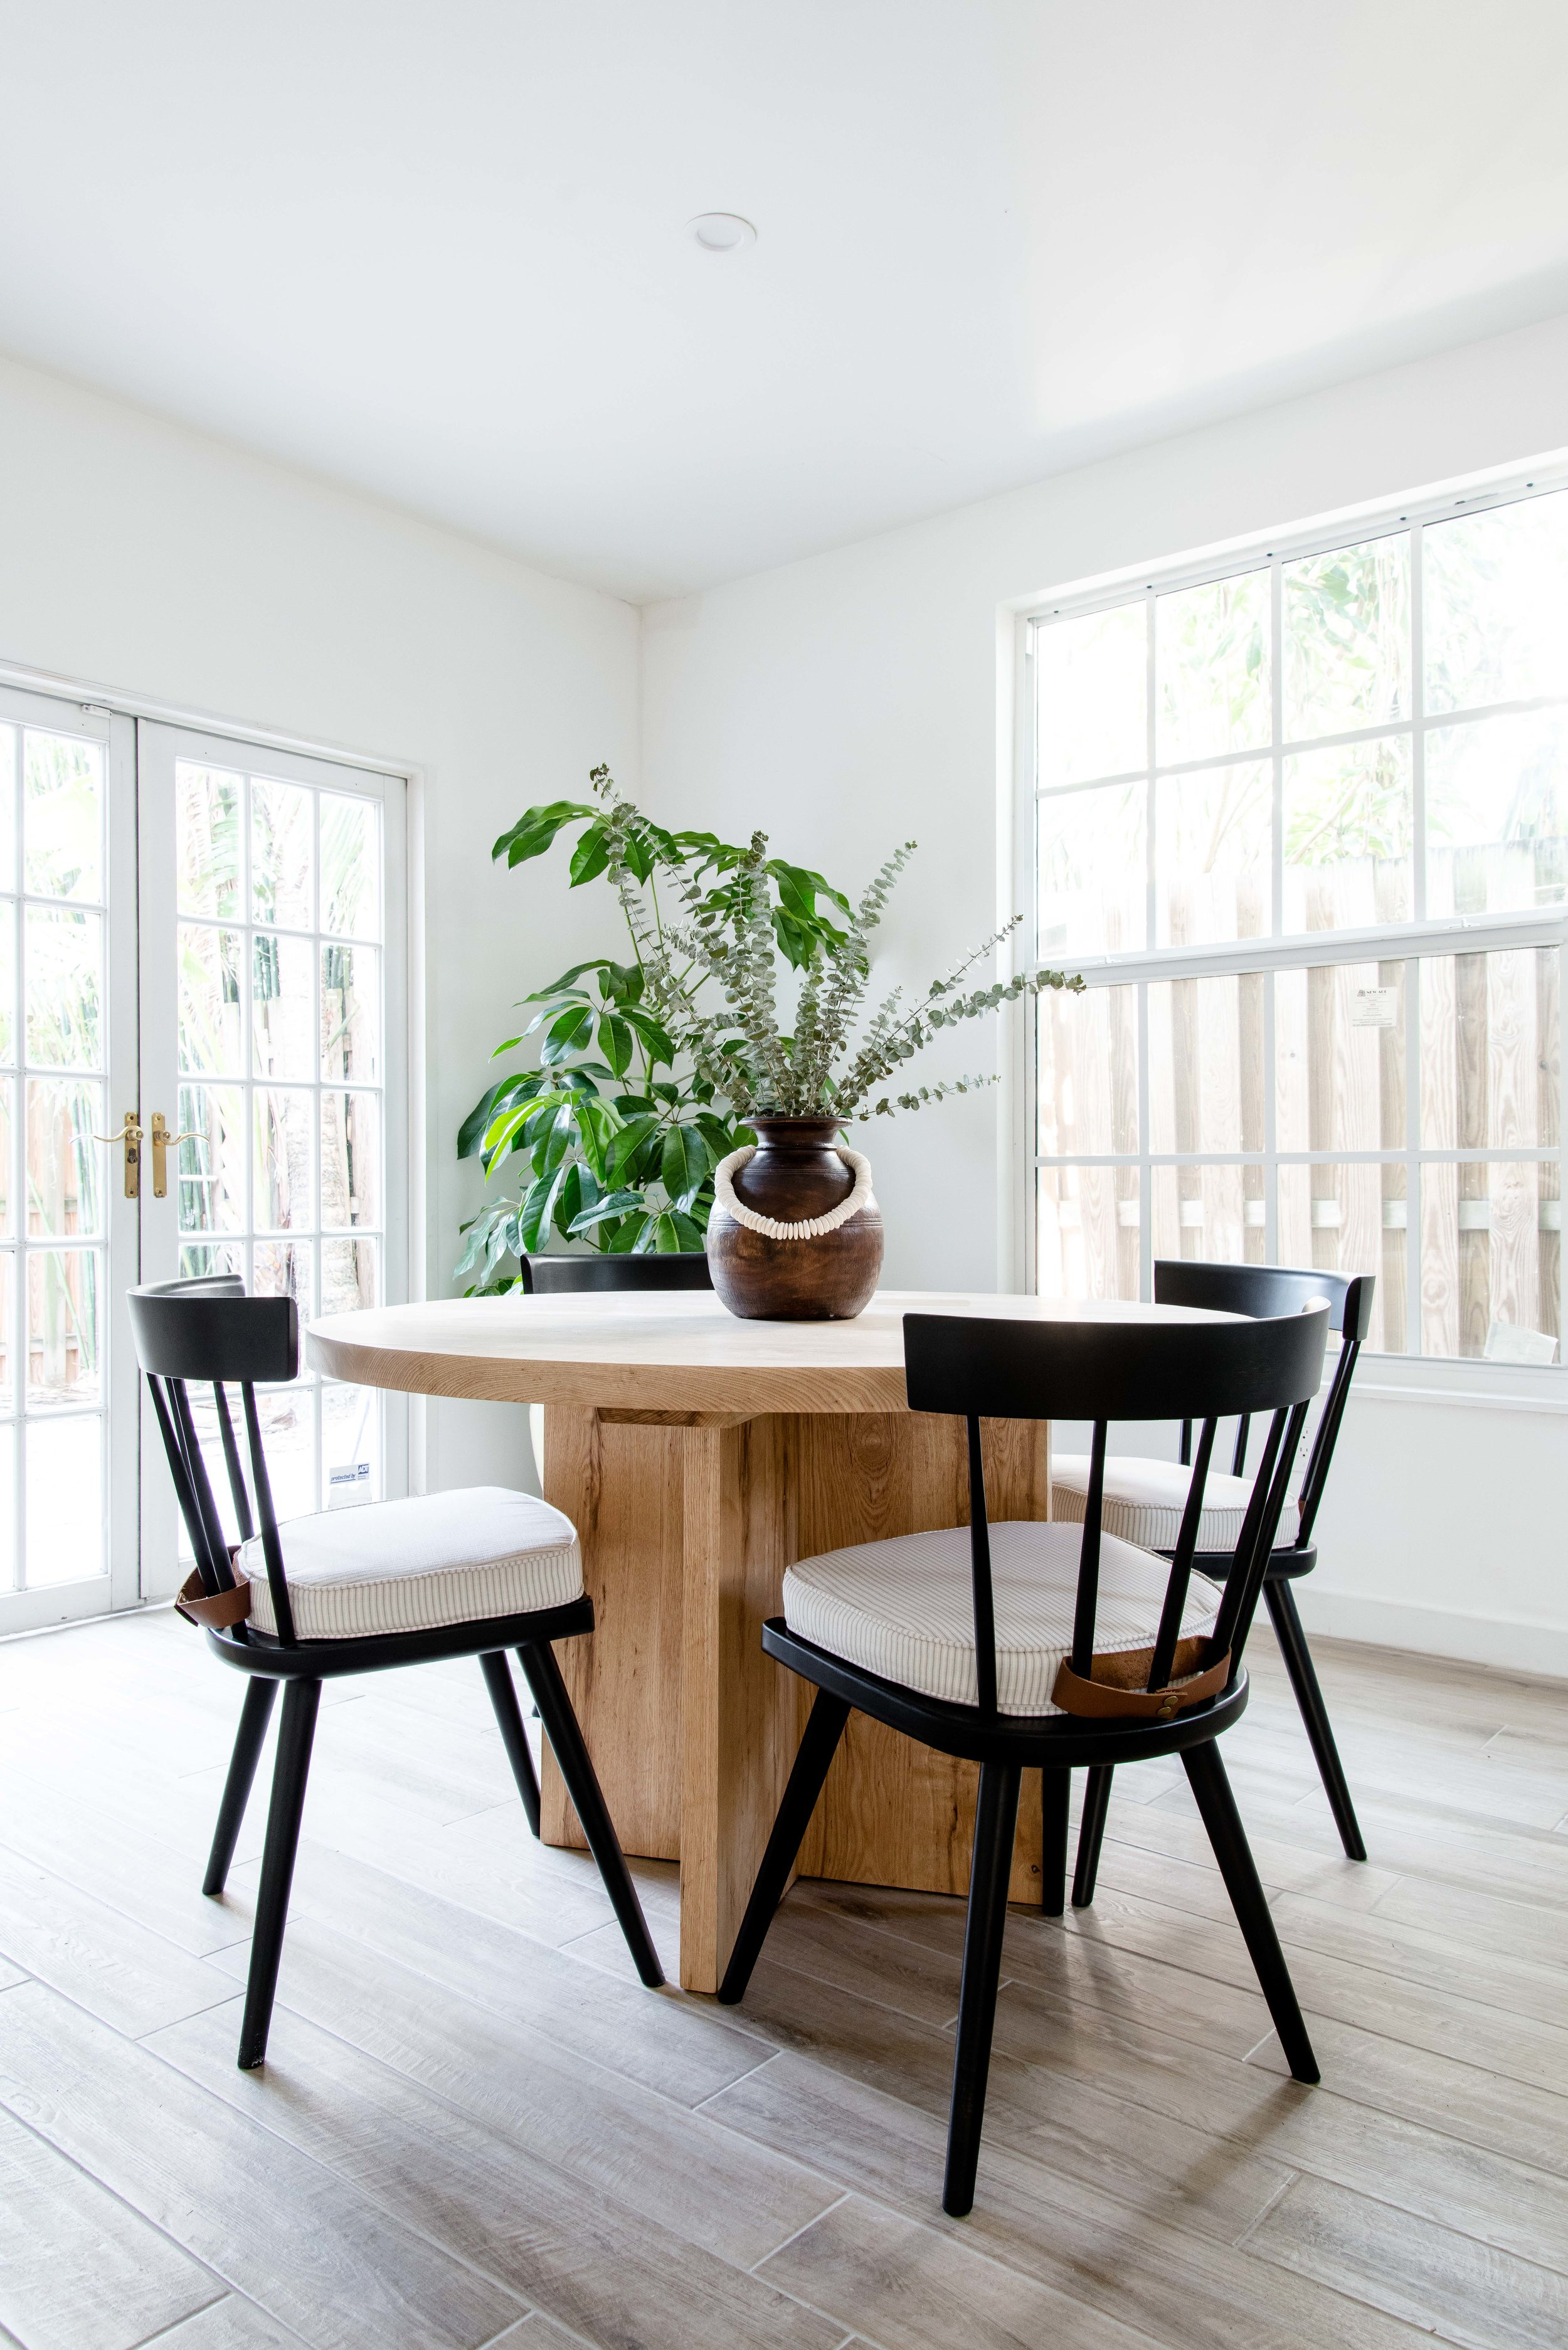 Sonder Stays Miami Interior Design Photographer Lifestyle Home Interiors Photography-26.jpg